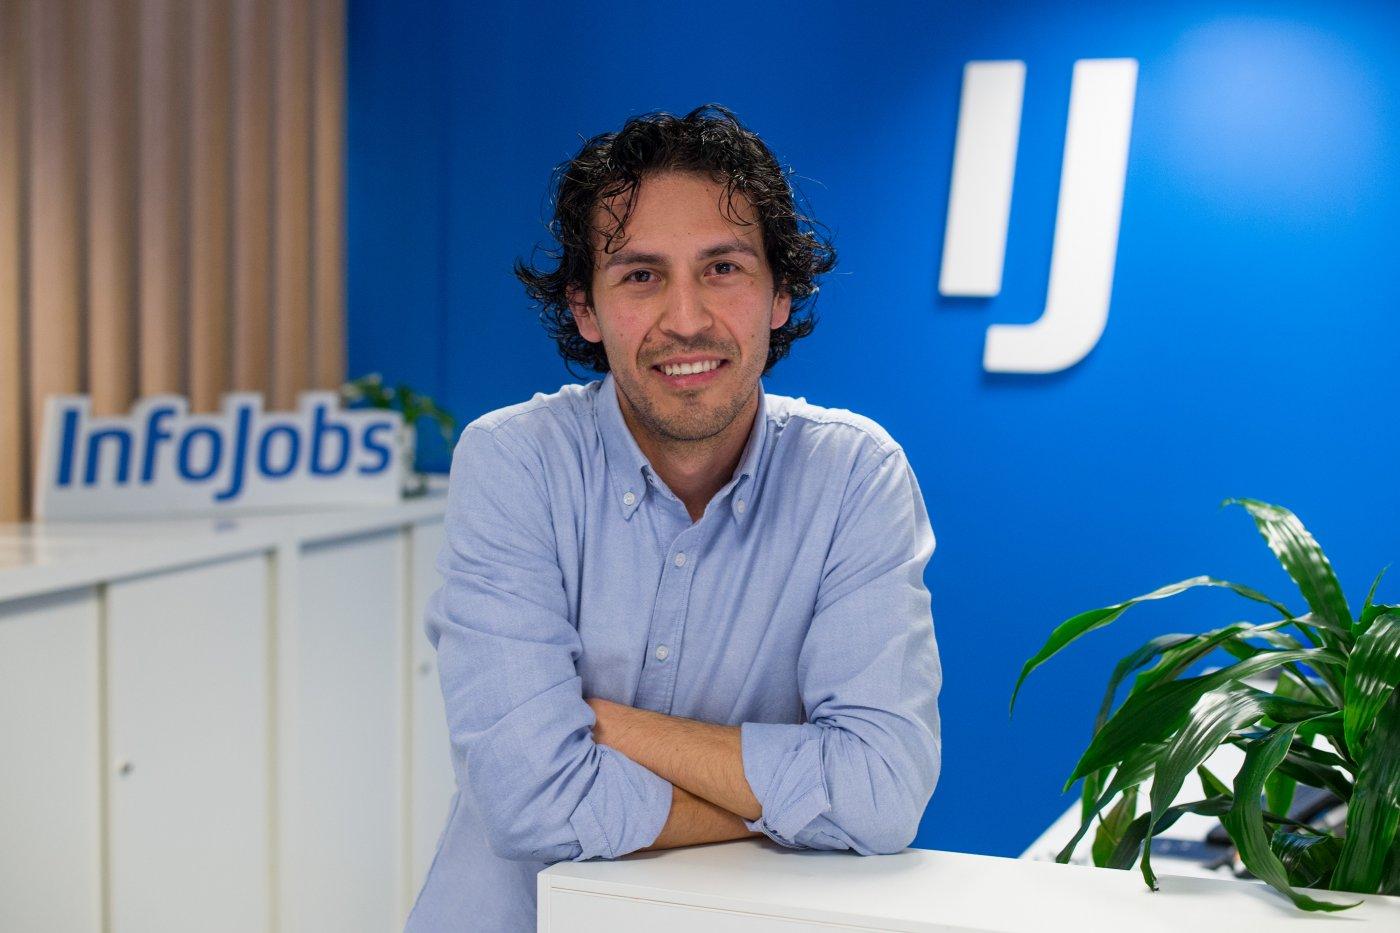 Nilton Navarro, Social Media Manager & Content de InfoJobs